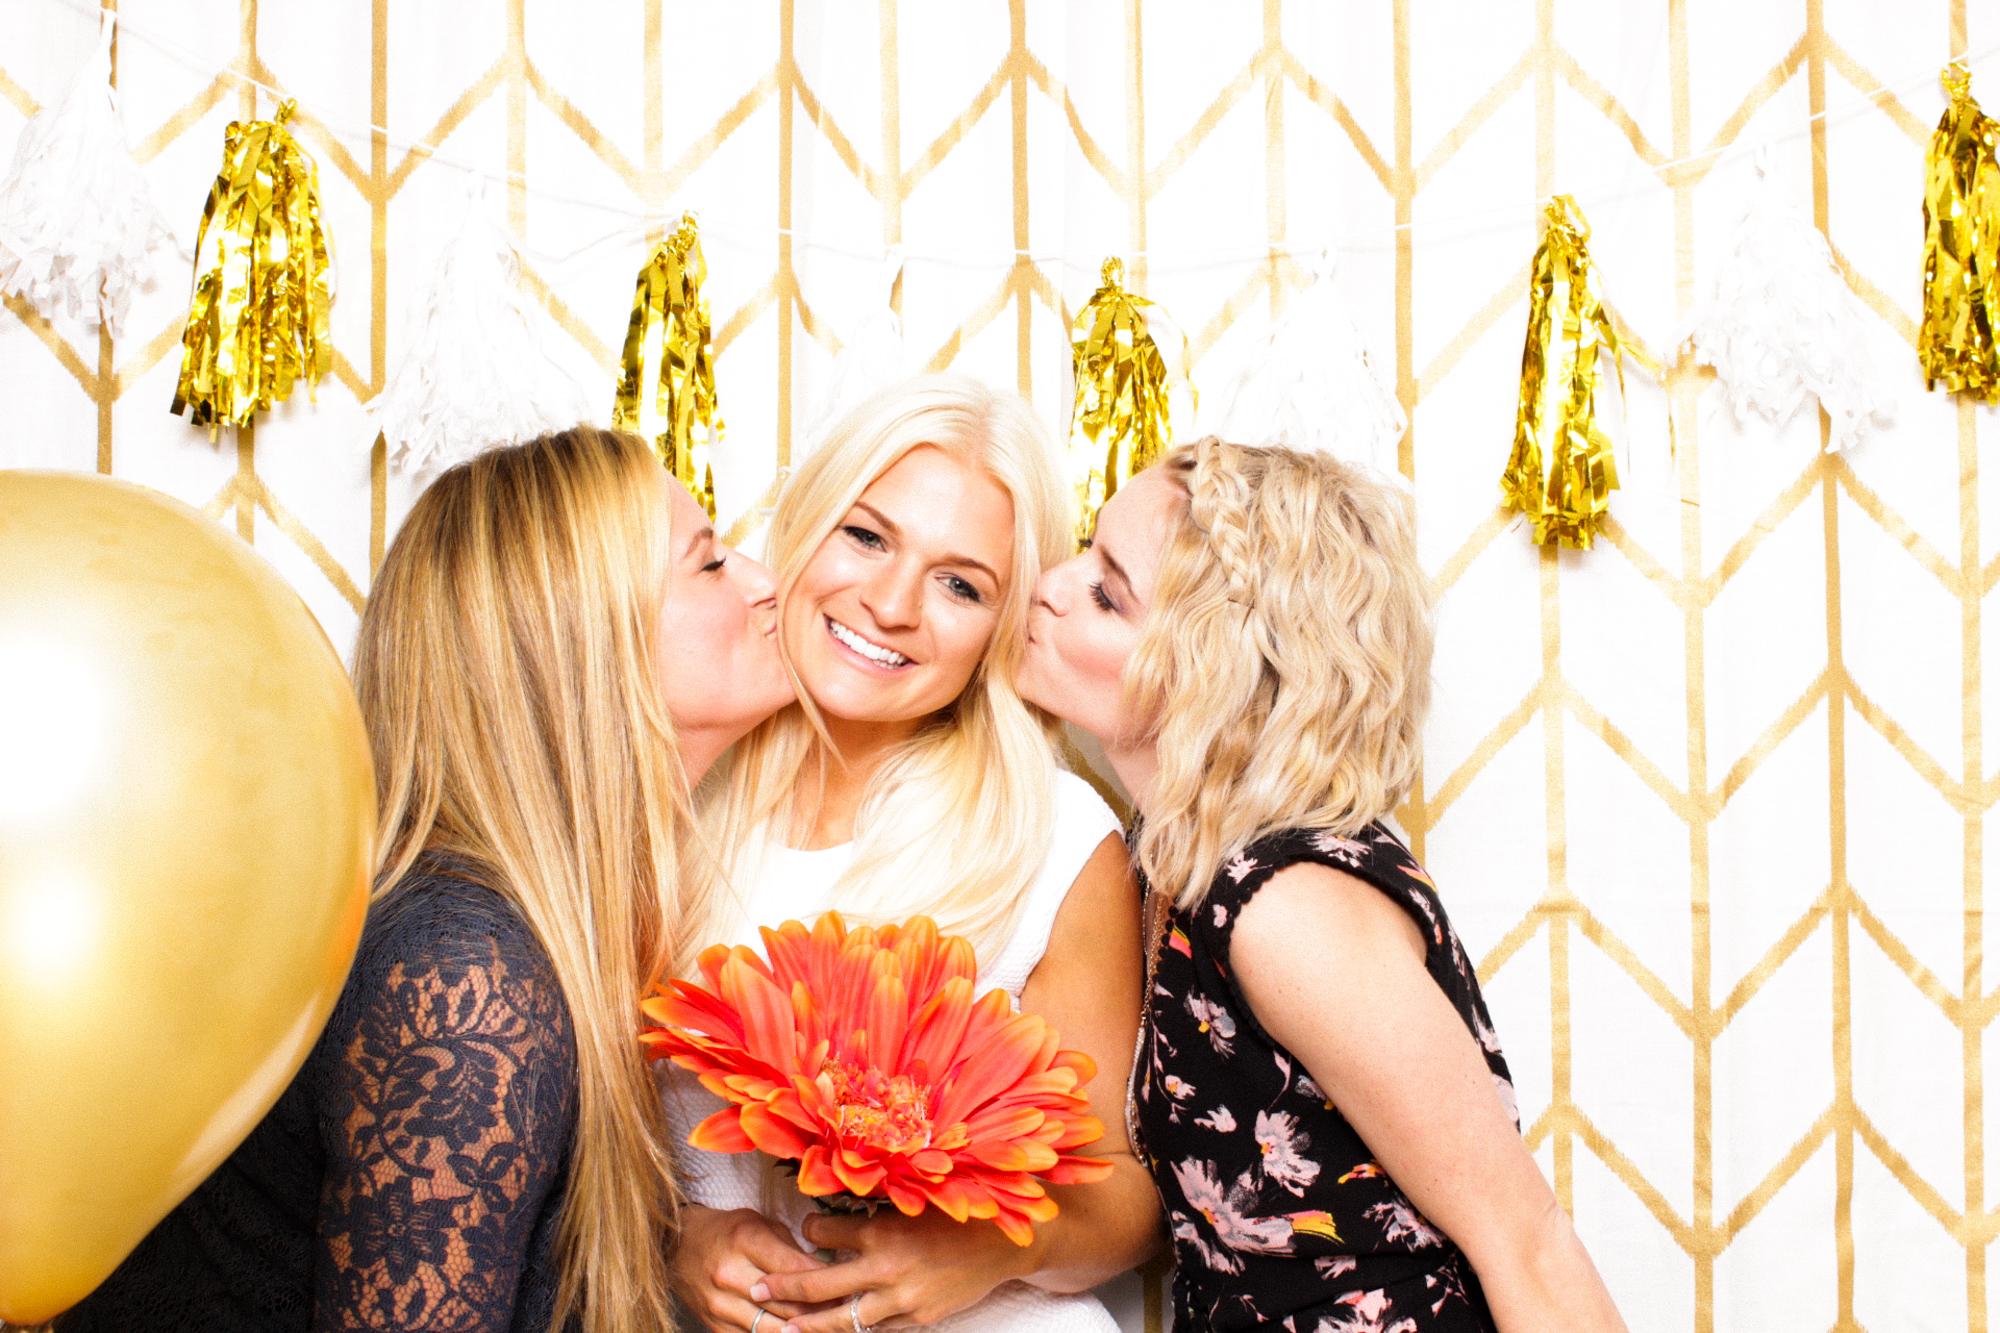 The_Reverie_Booth-Naples_Photobooth-Florida_Photobooth_Rental-Wedding_Photobooth-015.jpg